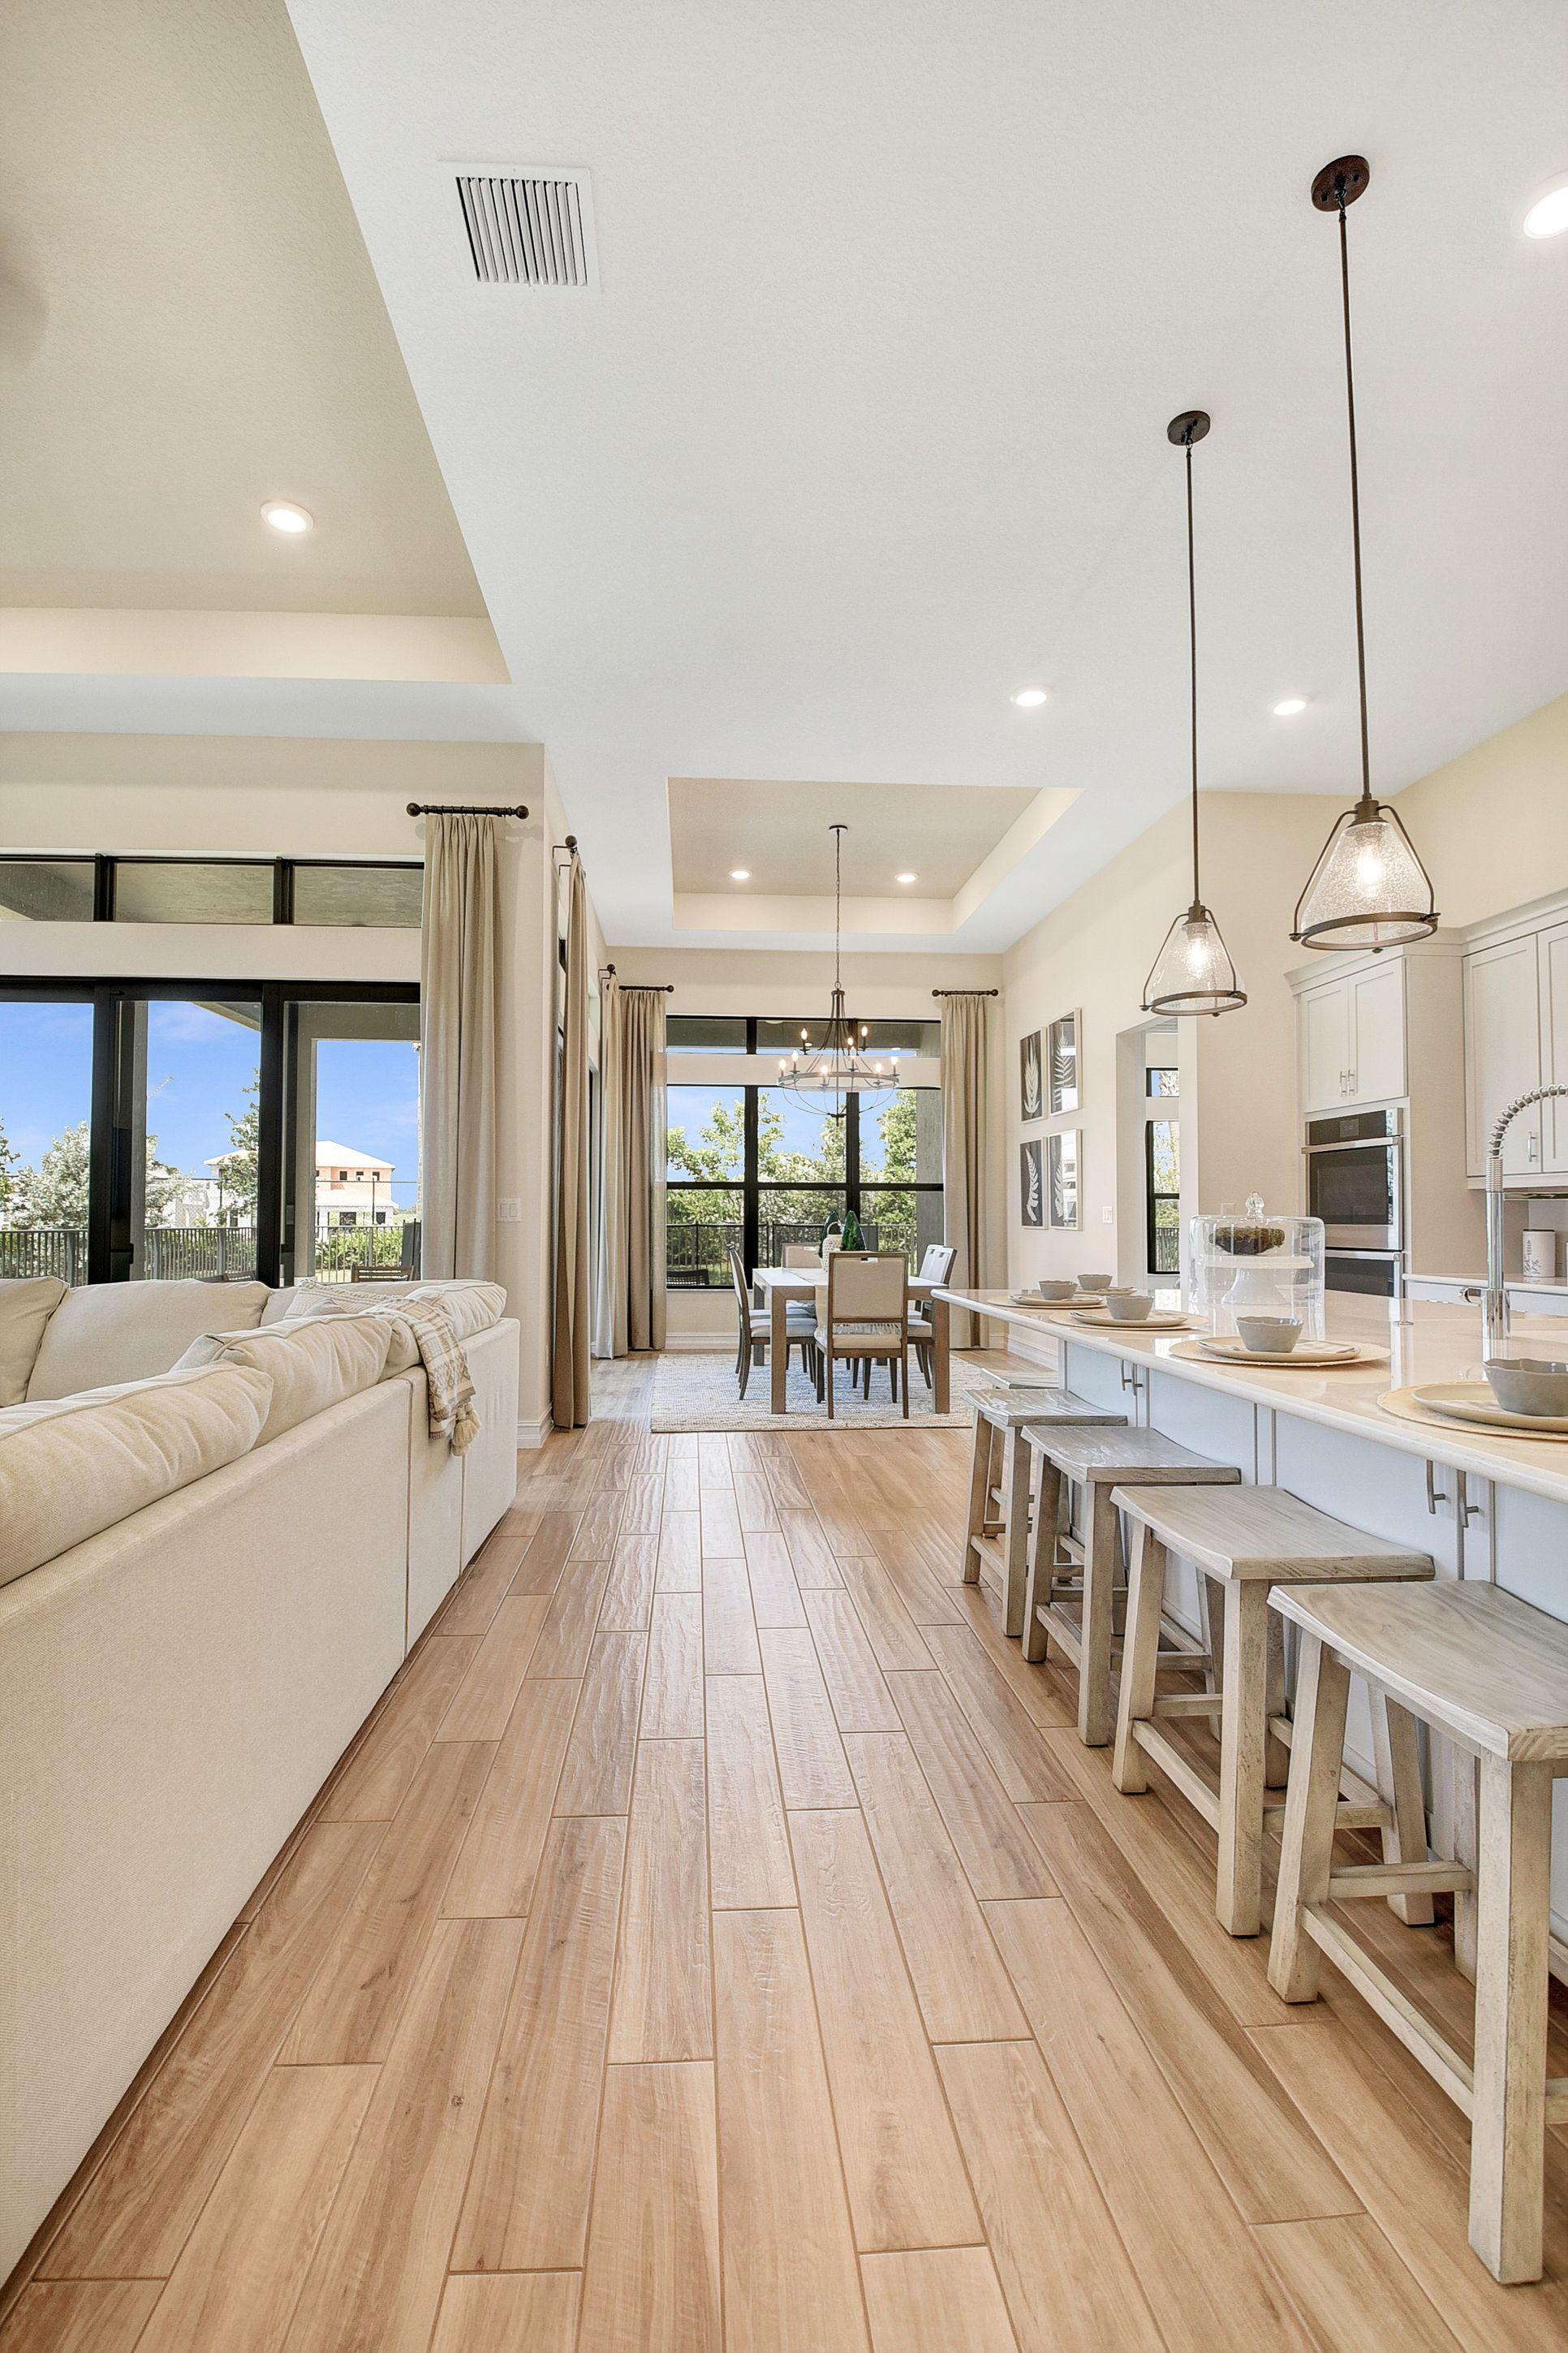 Interior:Kitchen adjacent to great room